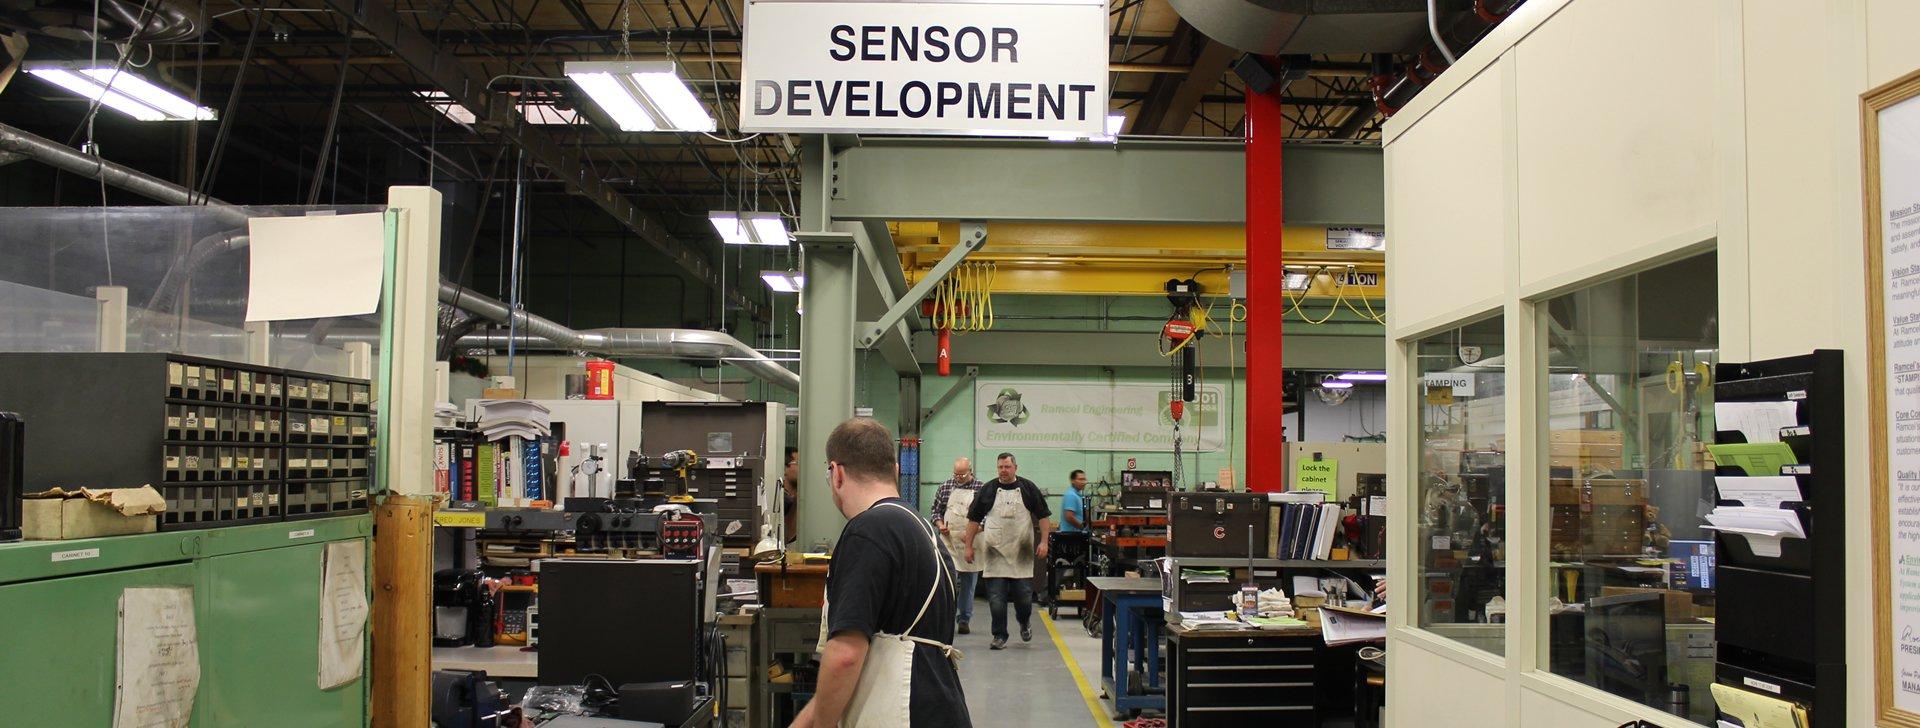 Ramcel Sensor Development